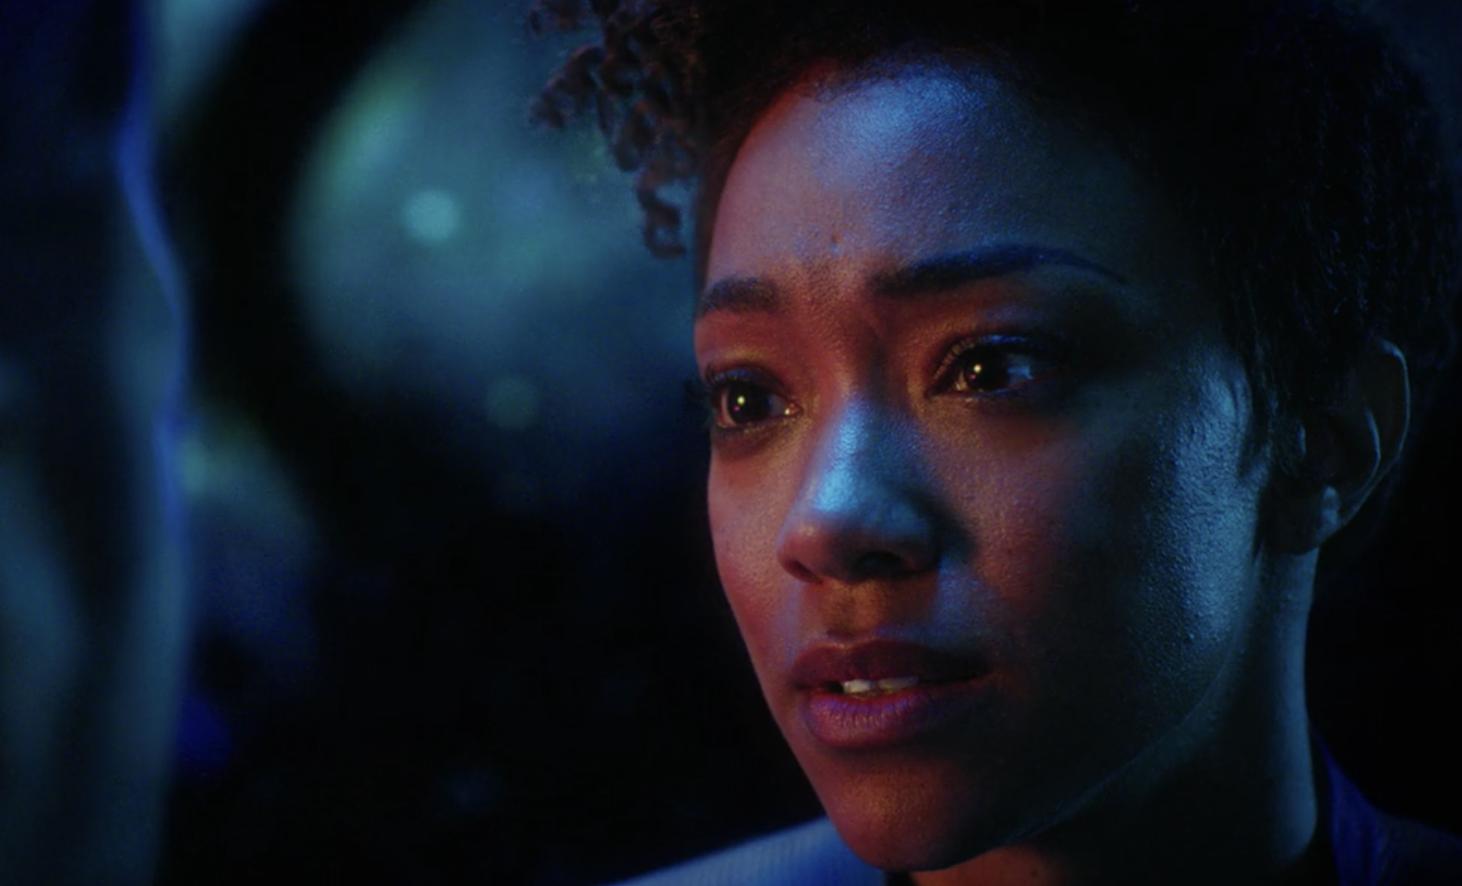 Sonequa Martin-Green as Michael Burnham in Star Trek: Discovery (Netflix, TL)